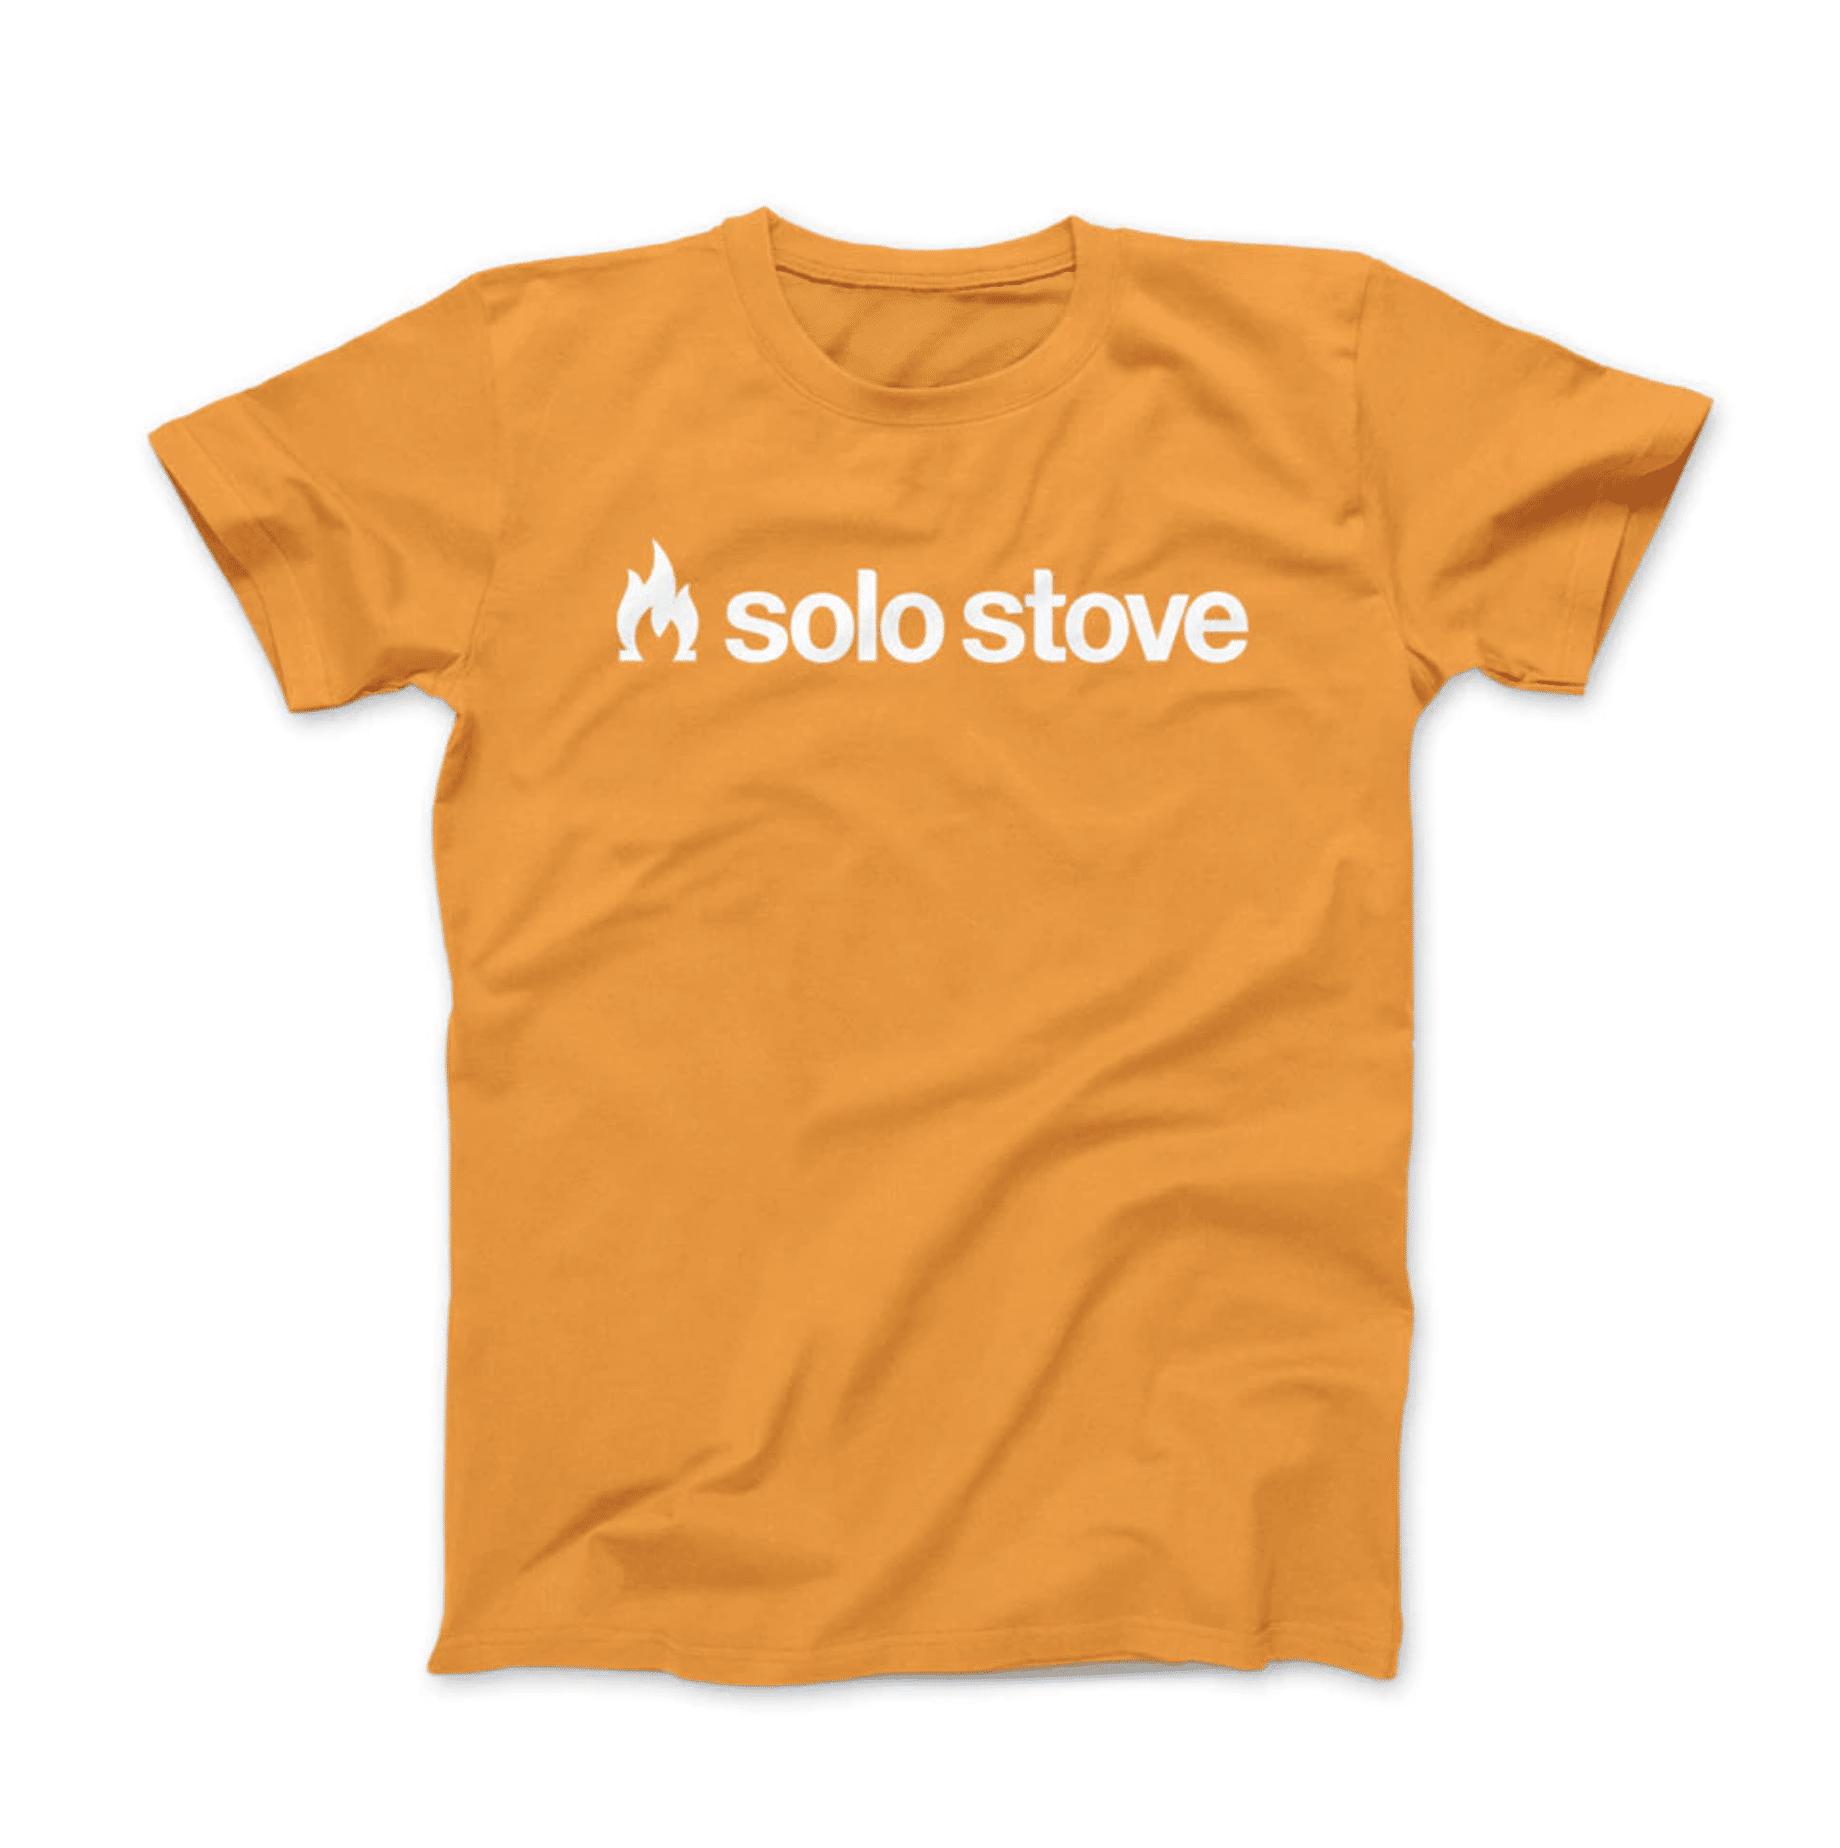 Solo Stove shirt